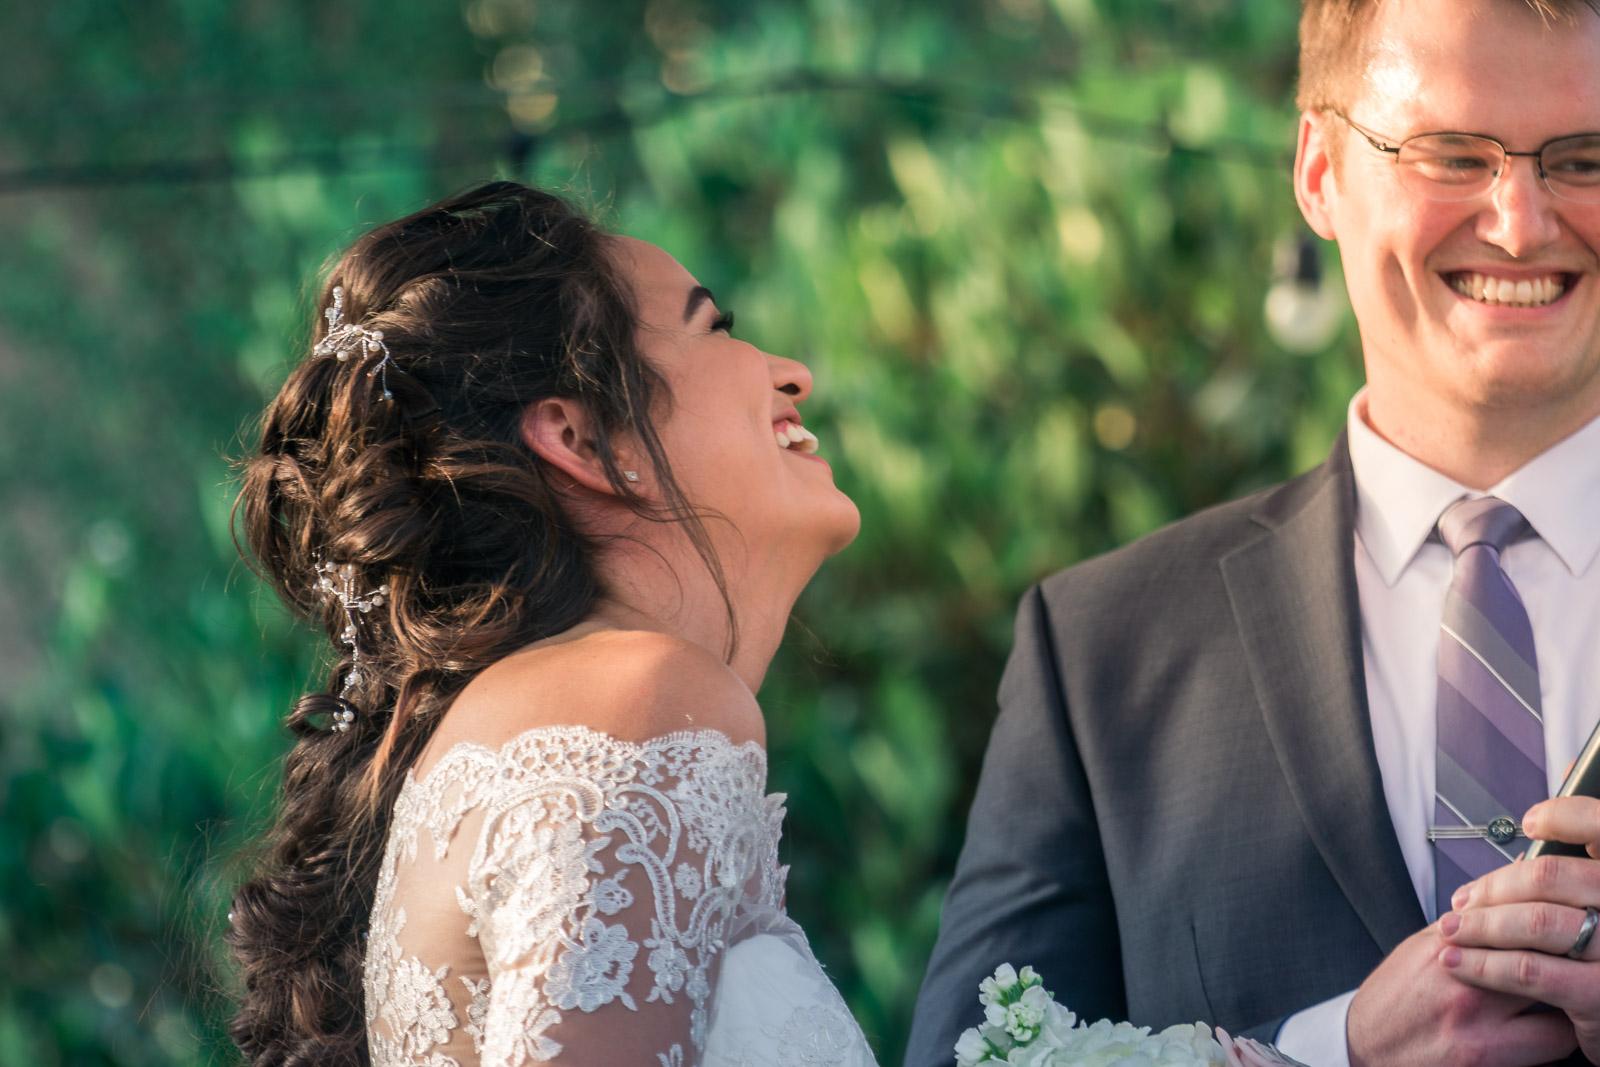 244_Angel-Brea-Orange-County_Joseph-Barber-Wedding-Photography.jpg